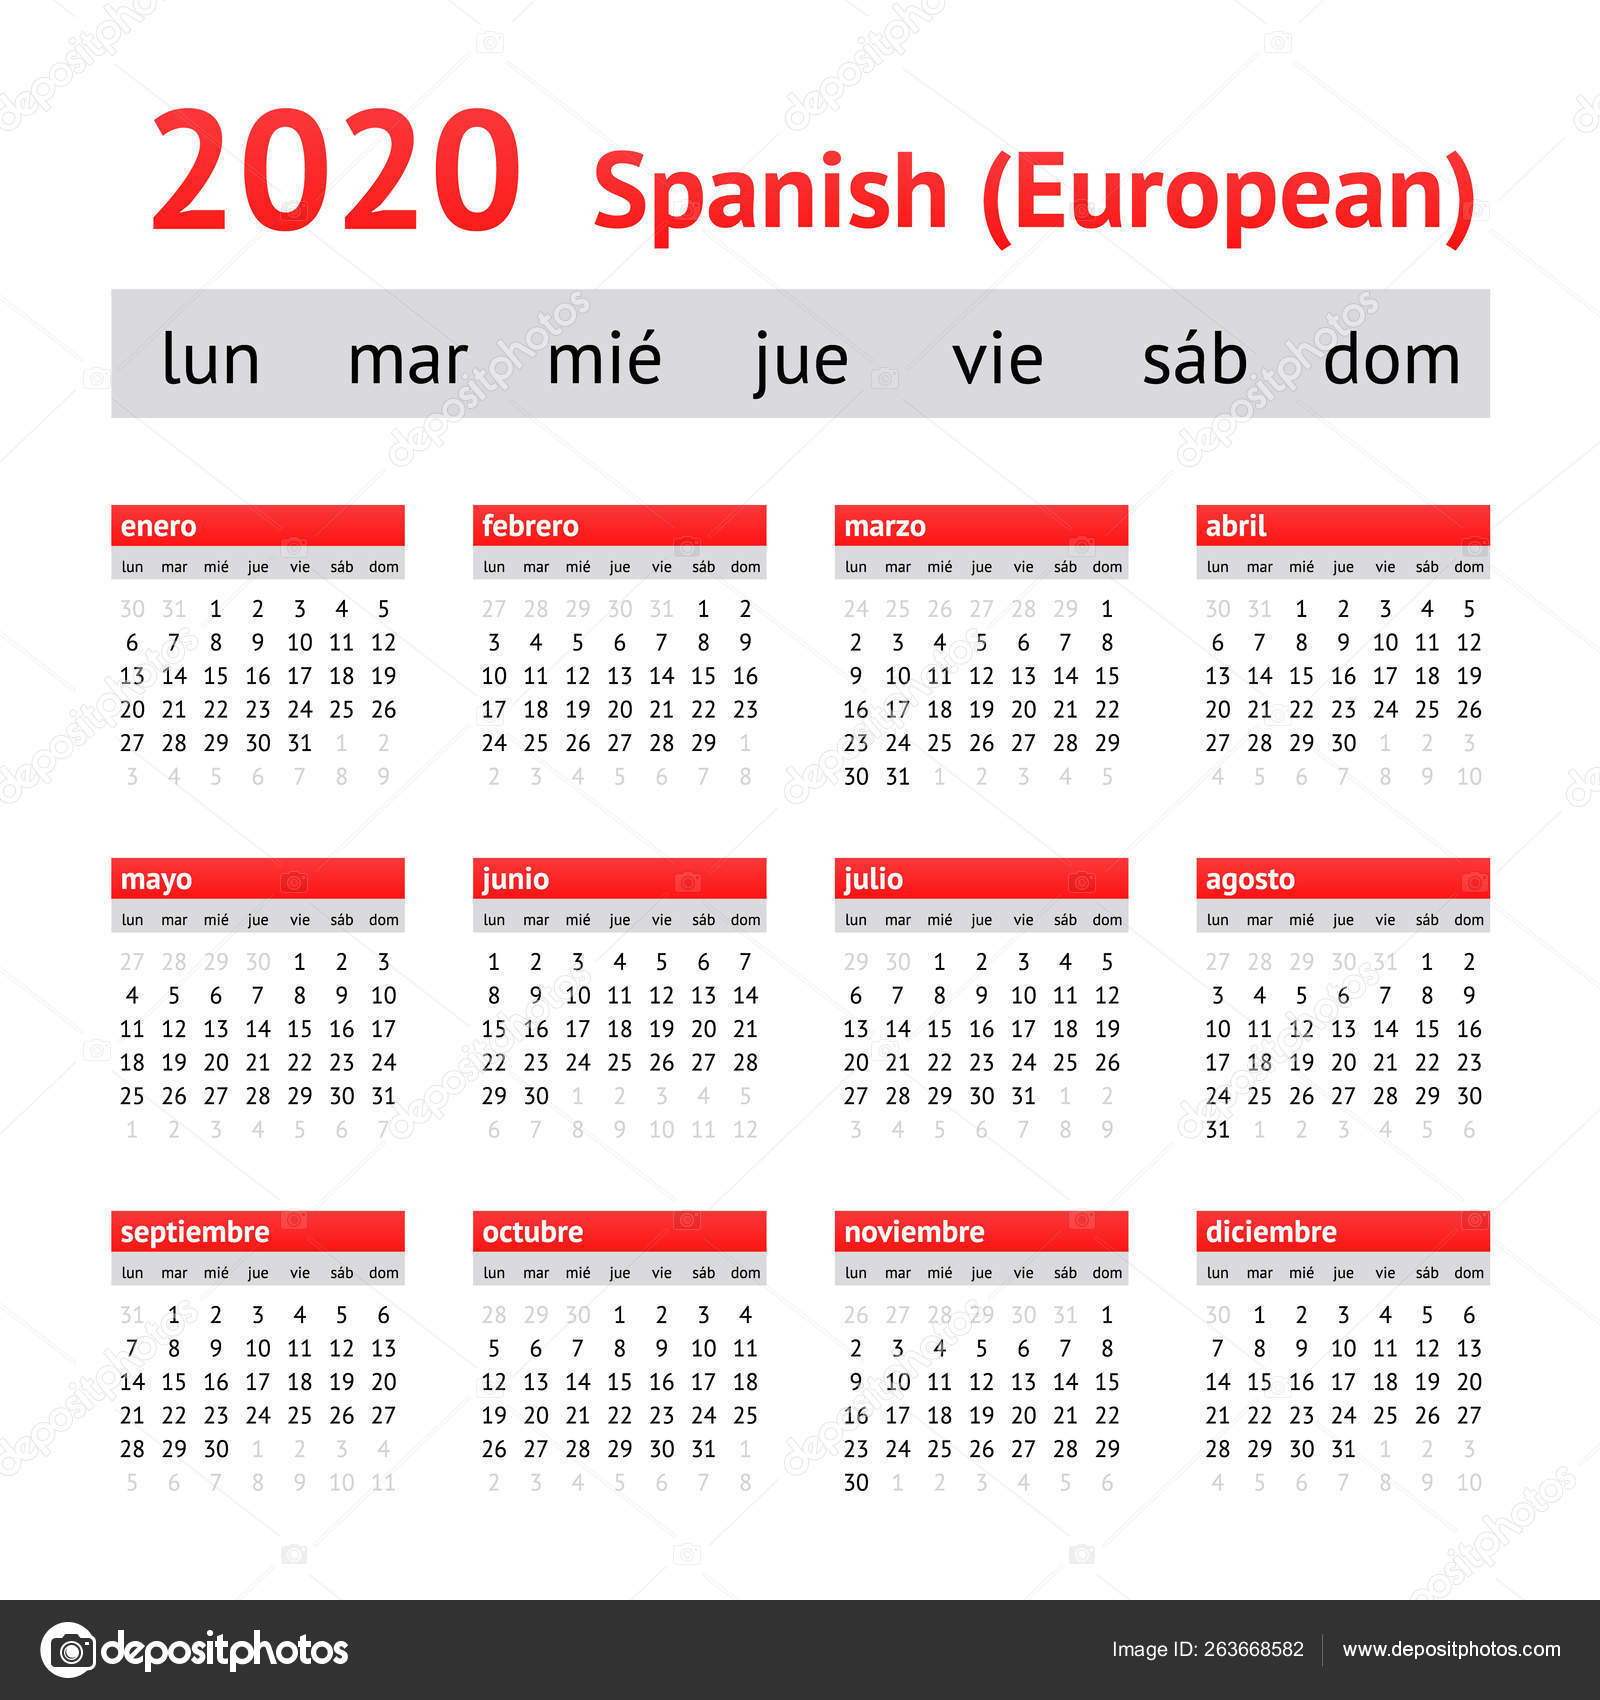 Календарь 2020 Испания. Европейский Испанский Календарь